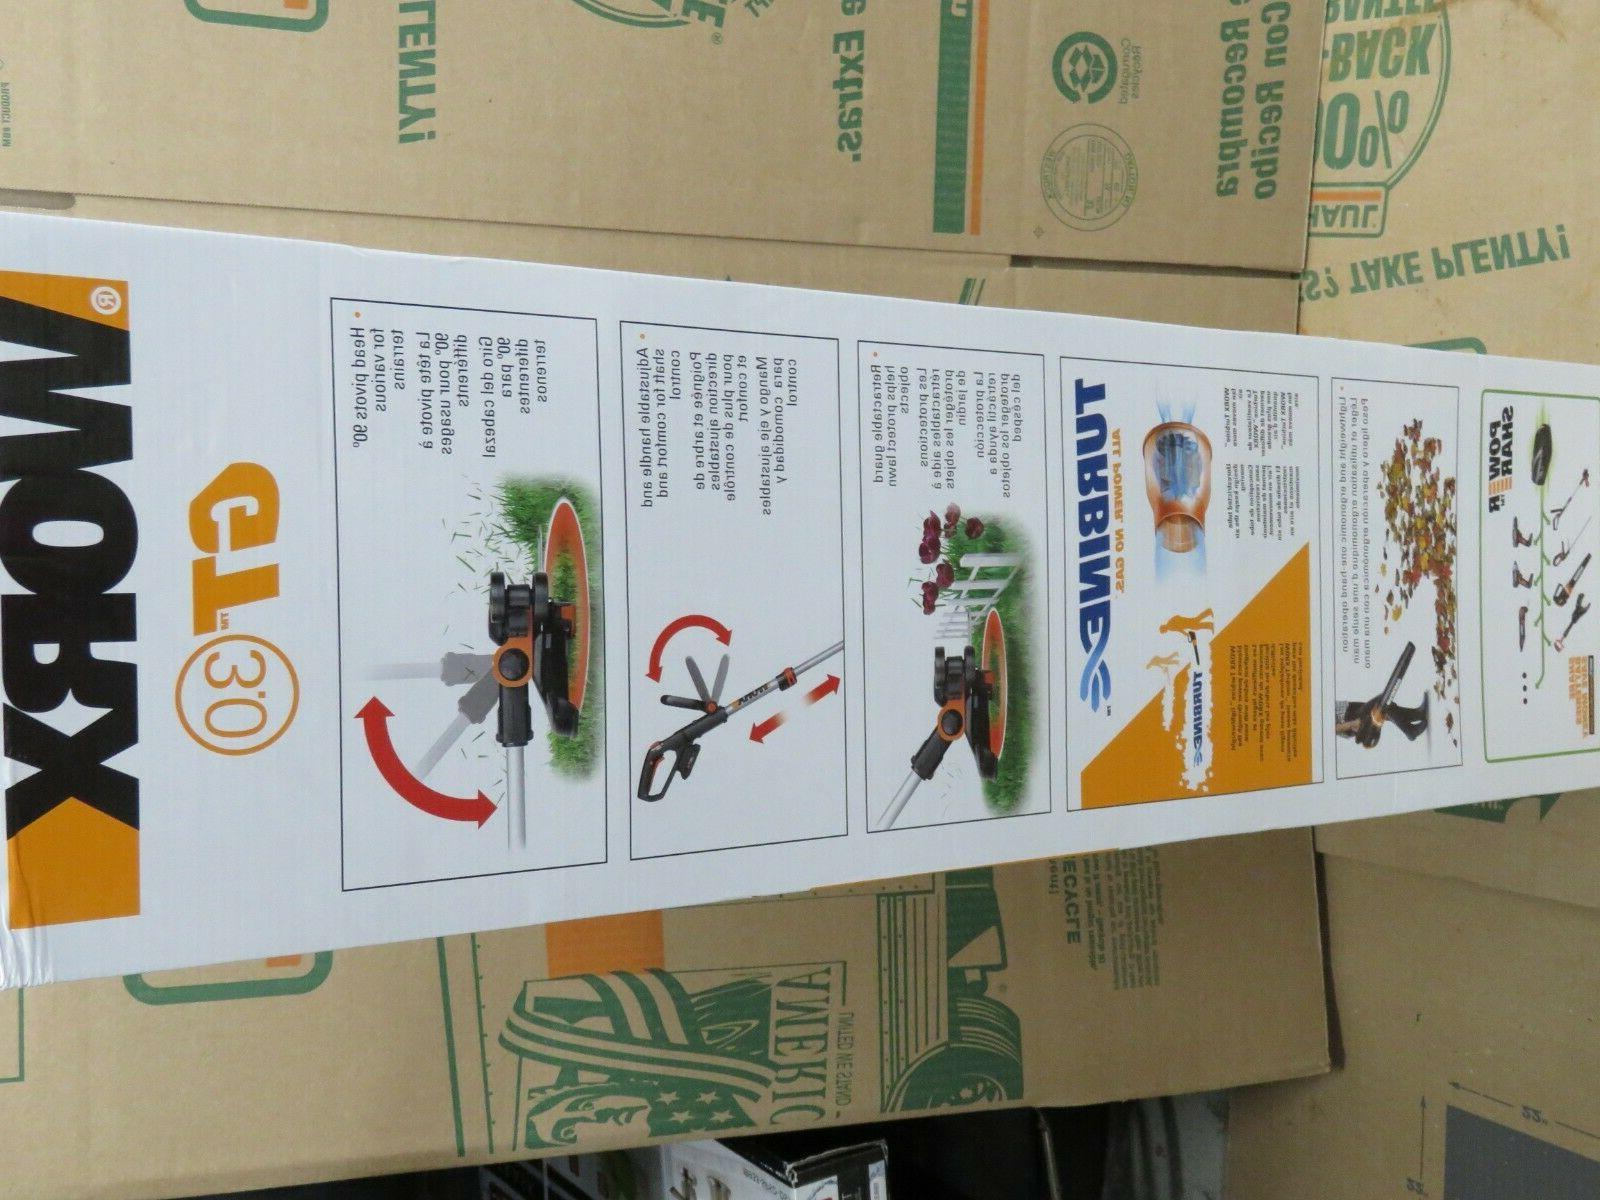 WORX WG921 PowerShare Grass Trimmer & Batteries